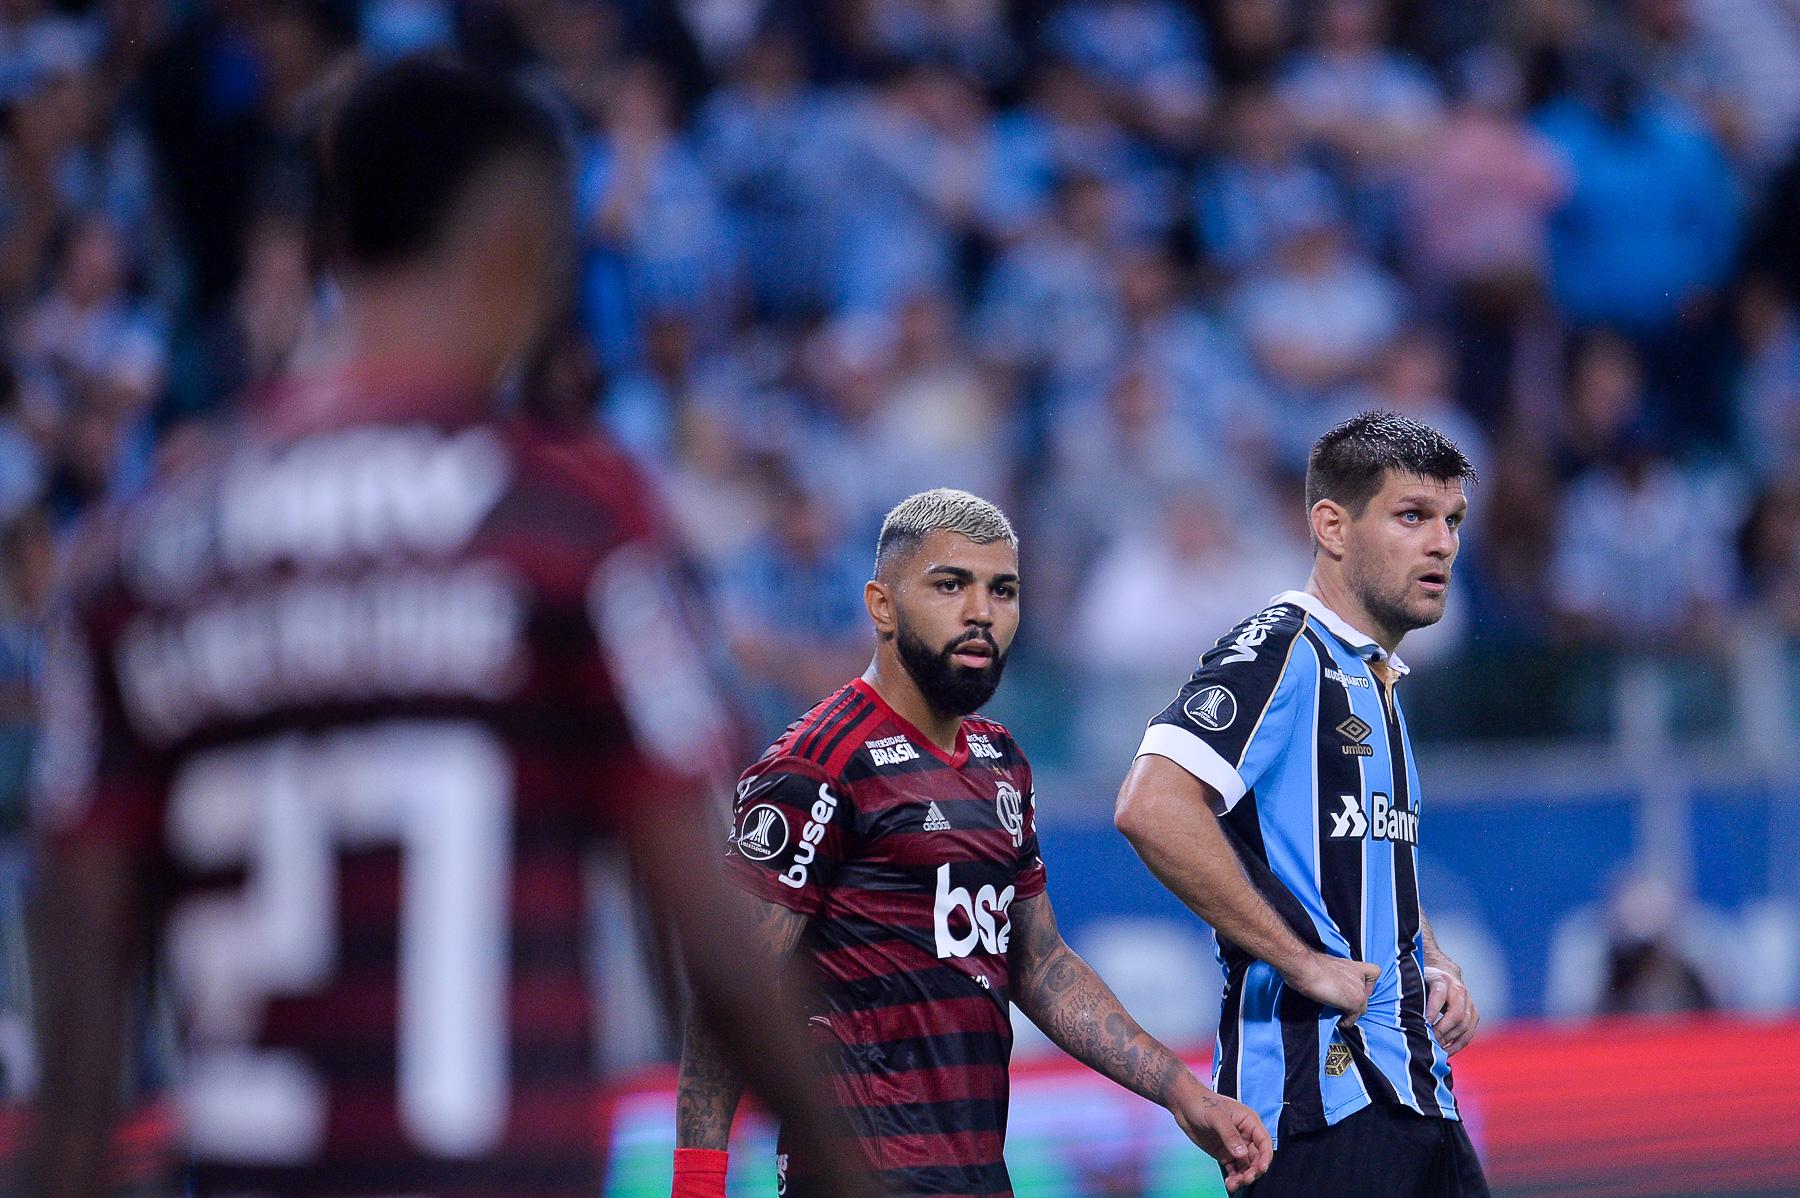 Gremio_X_Flamengo_dudabairros_Eleven_183